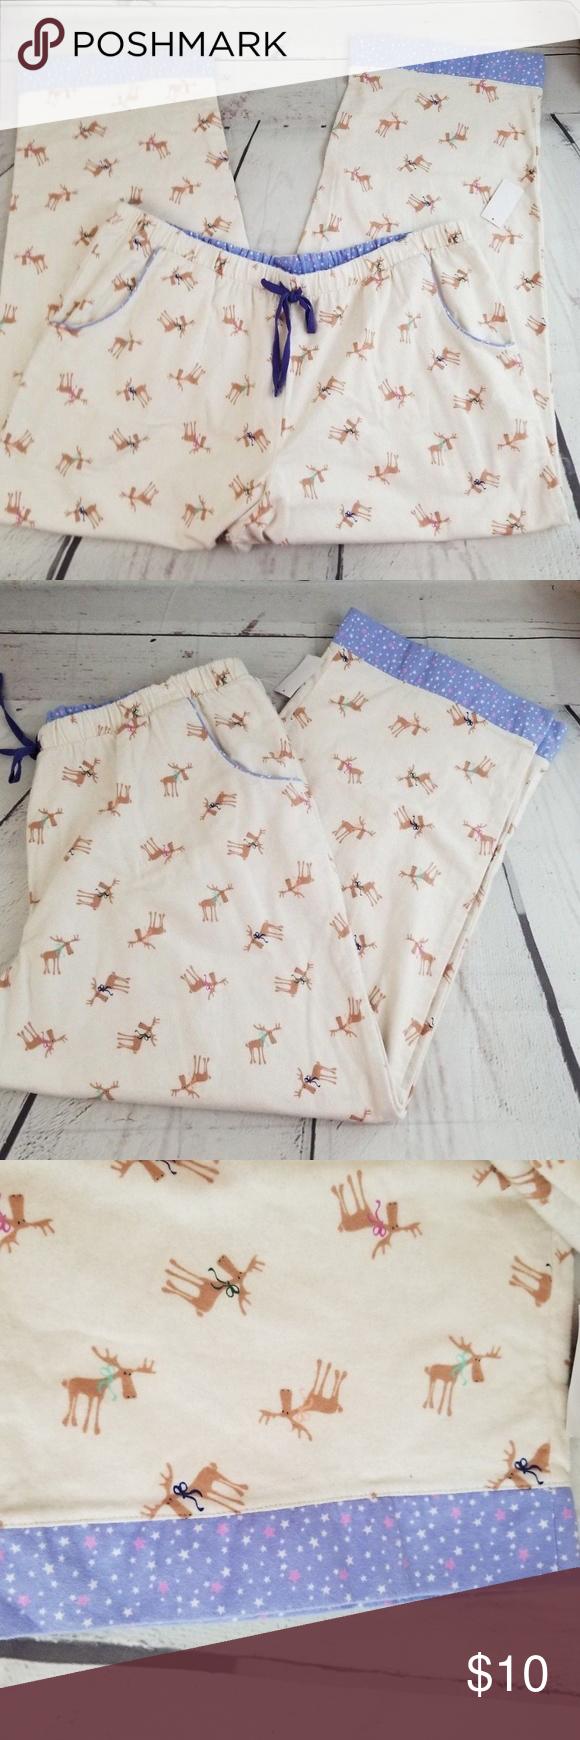 Joe boxer reindeer 2x christmas pajama pants Boutique | Pinterest ...